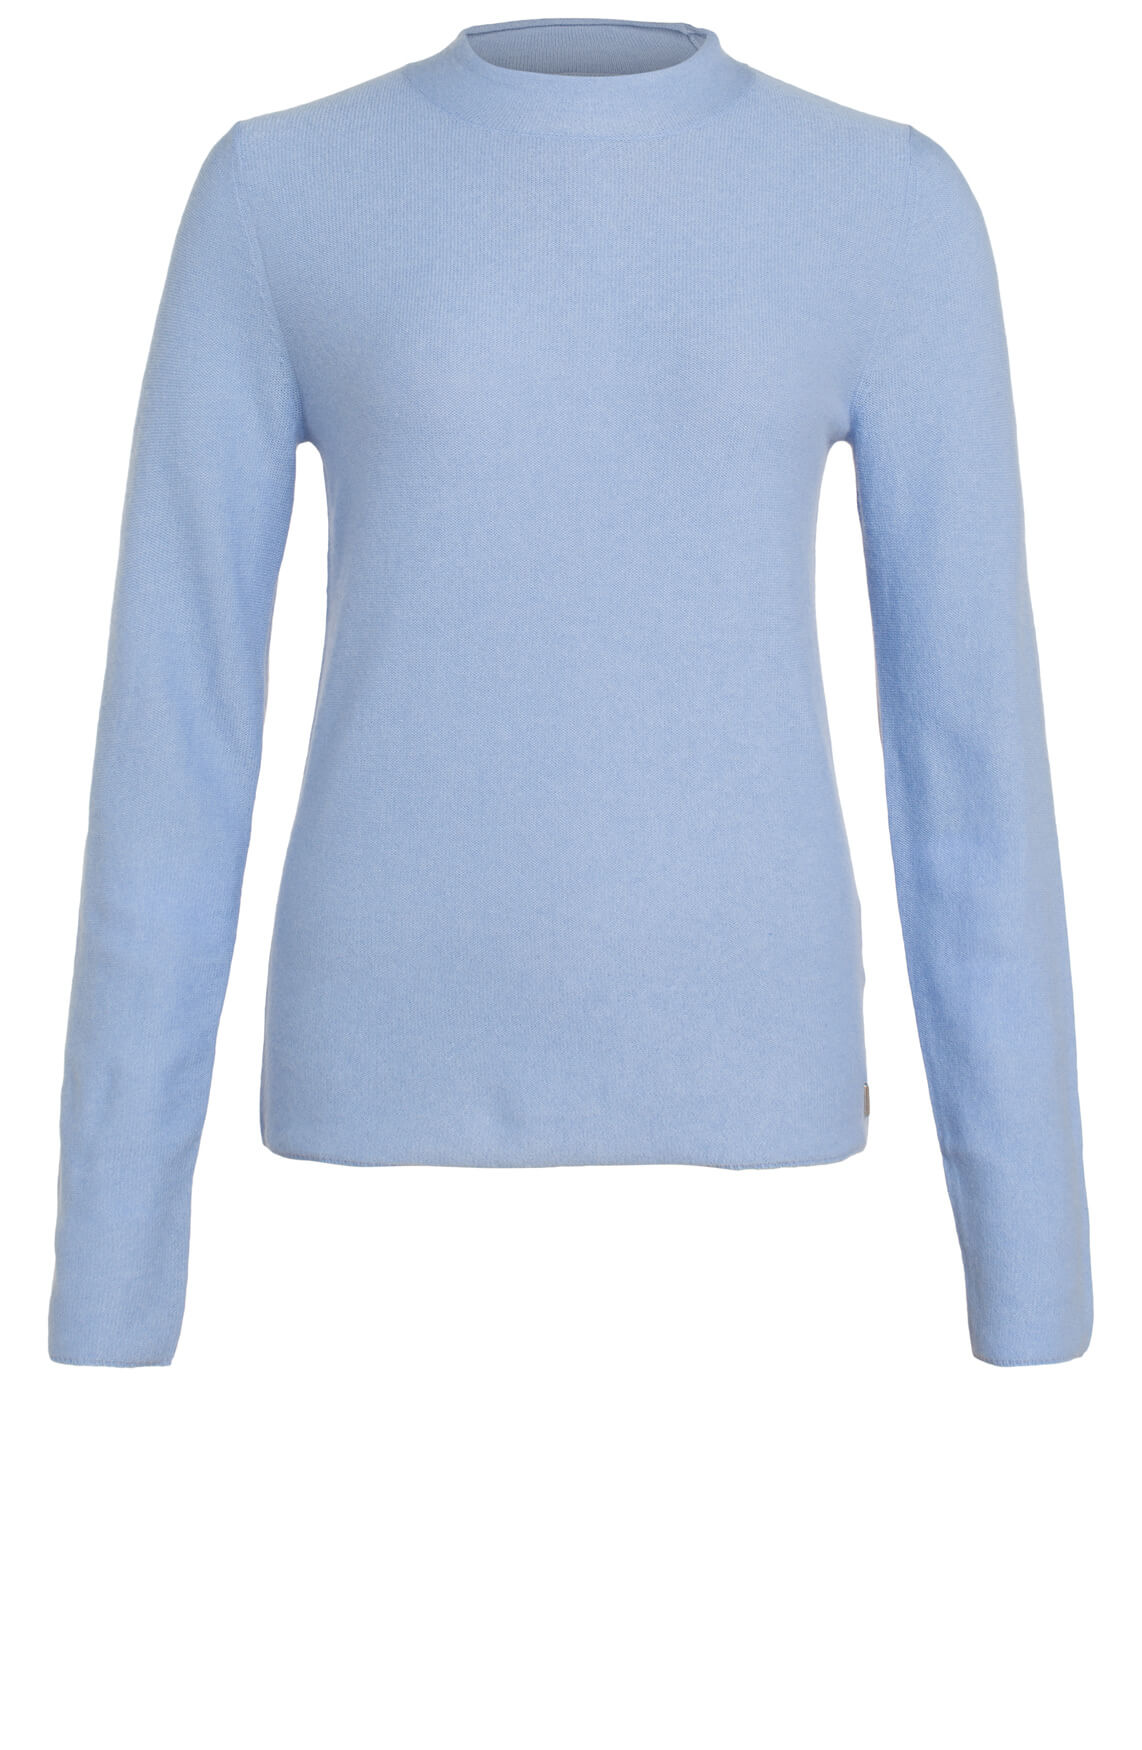 Anna Dames Cashmere pullover met col Blauw